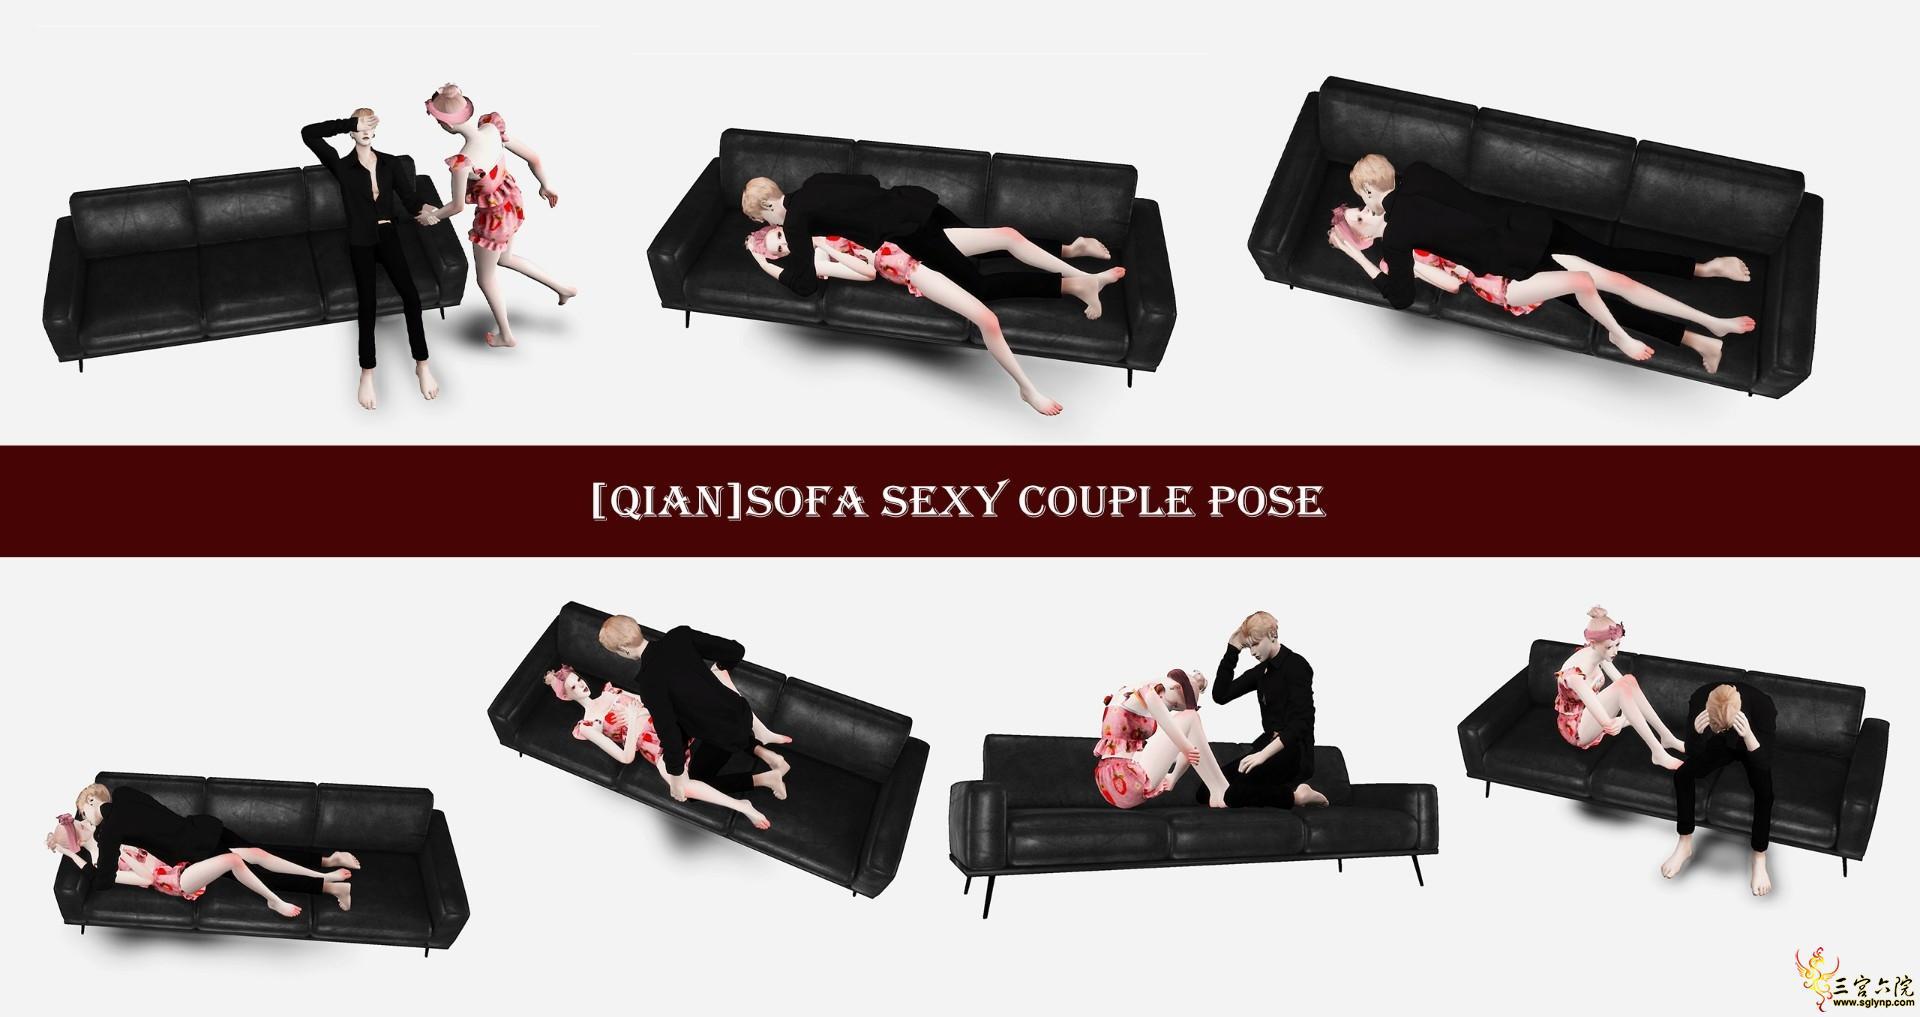 [Qian]Sofa sexy couple pose.jpg